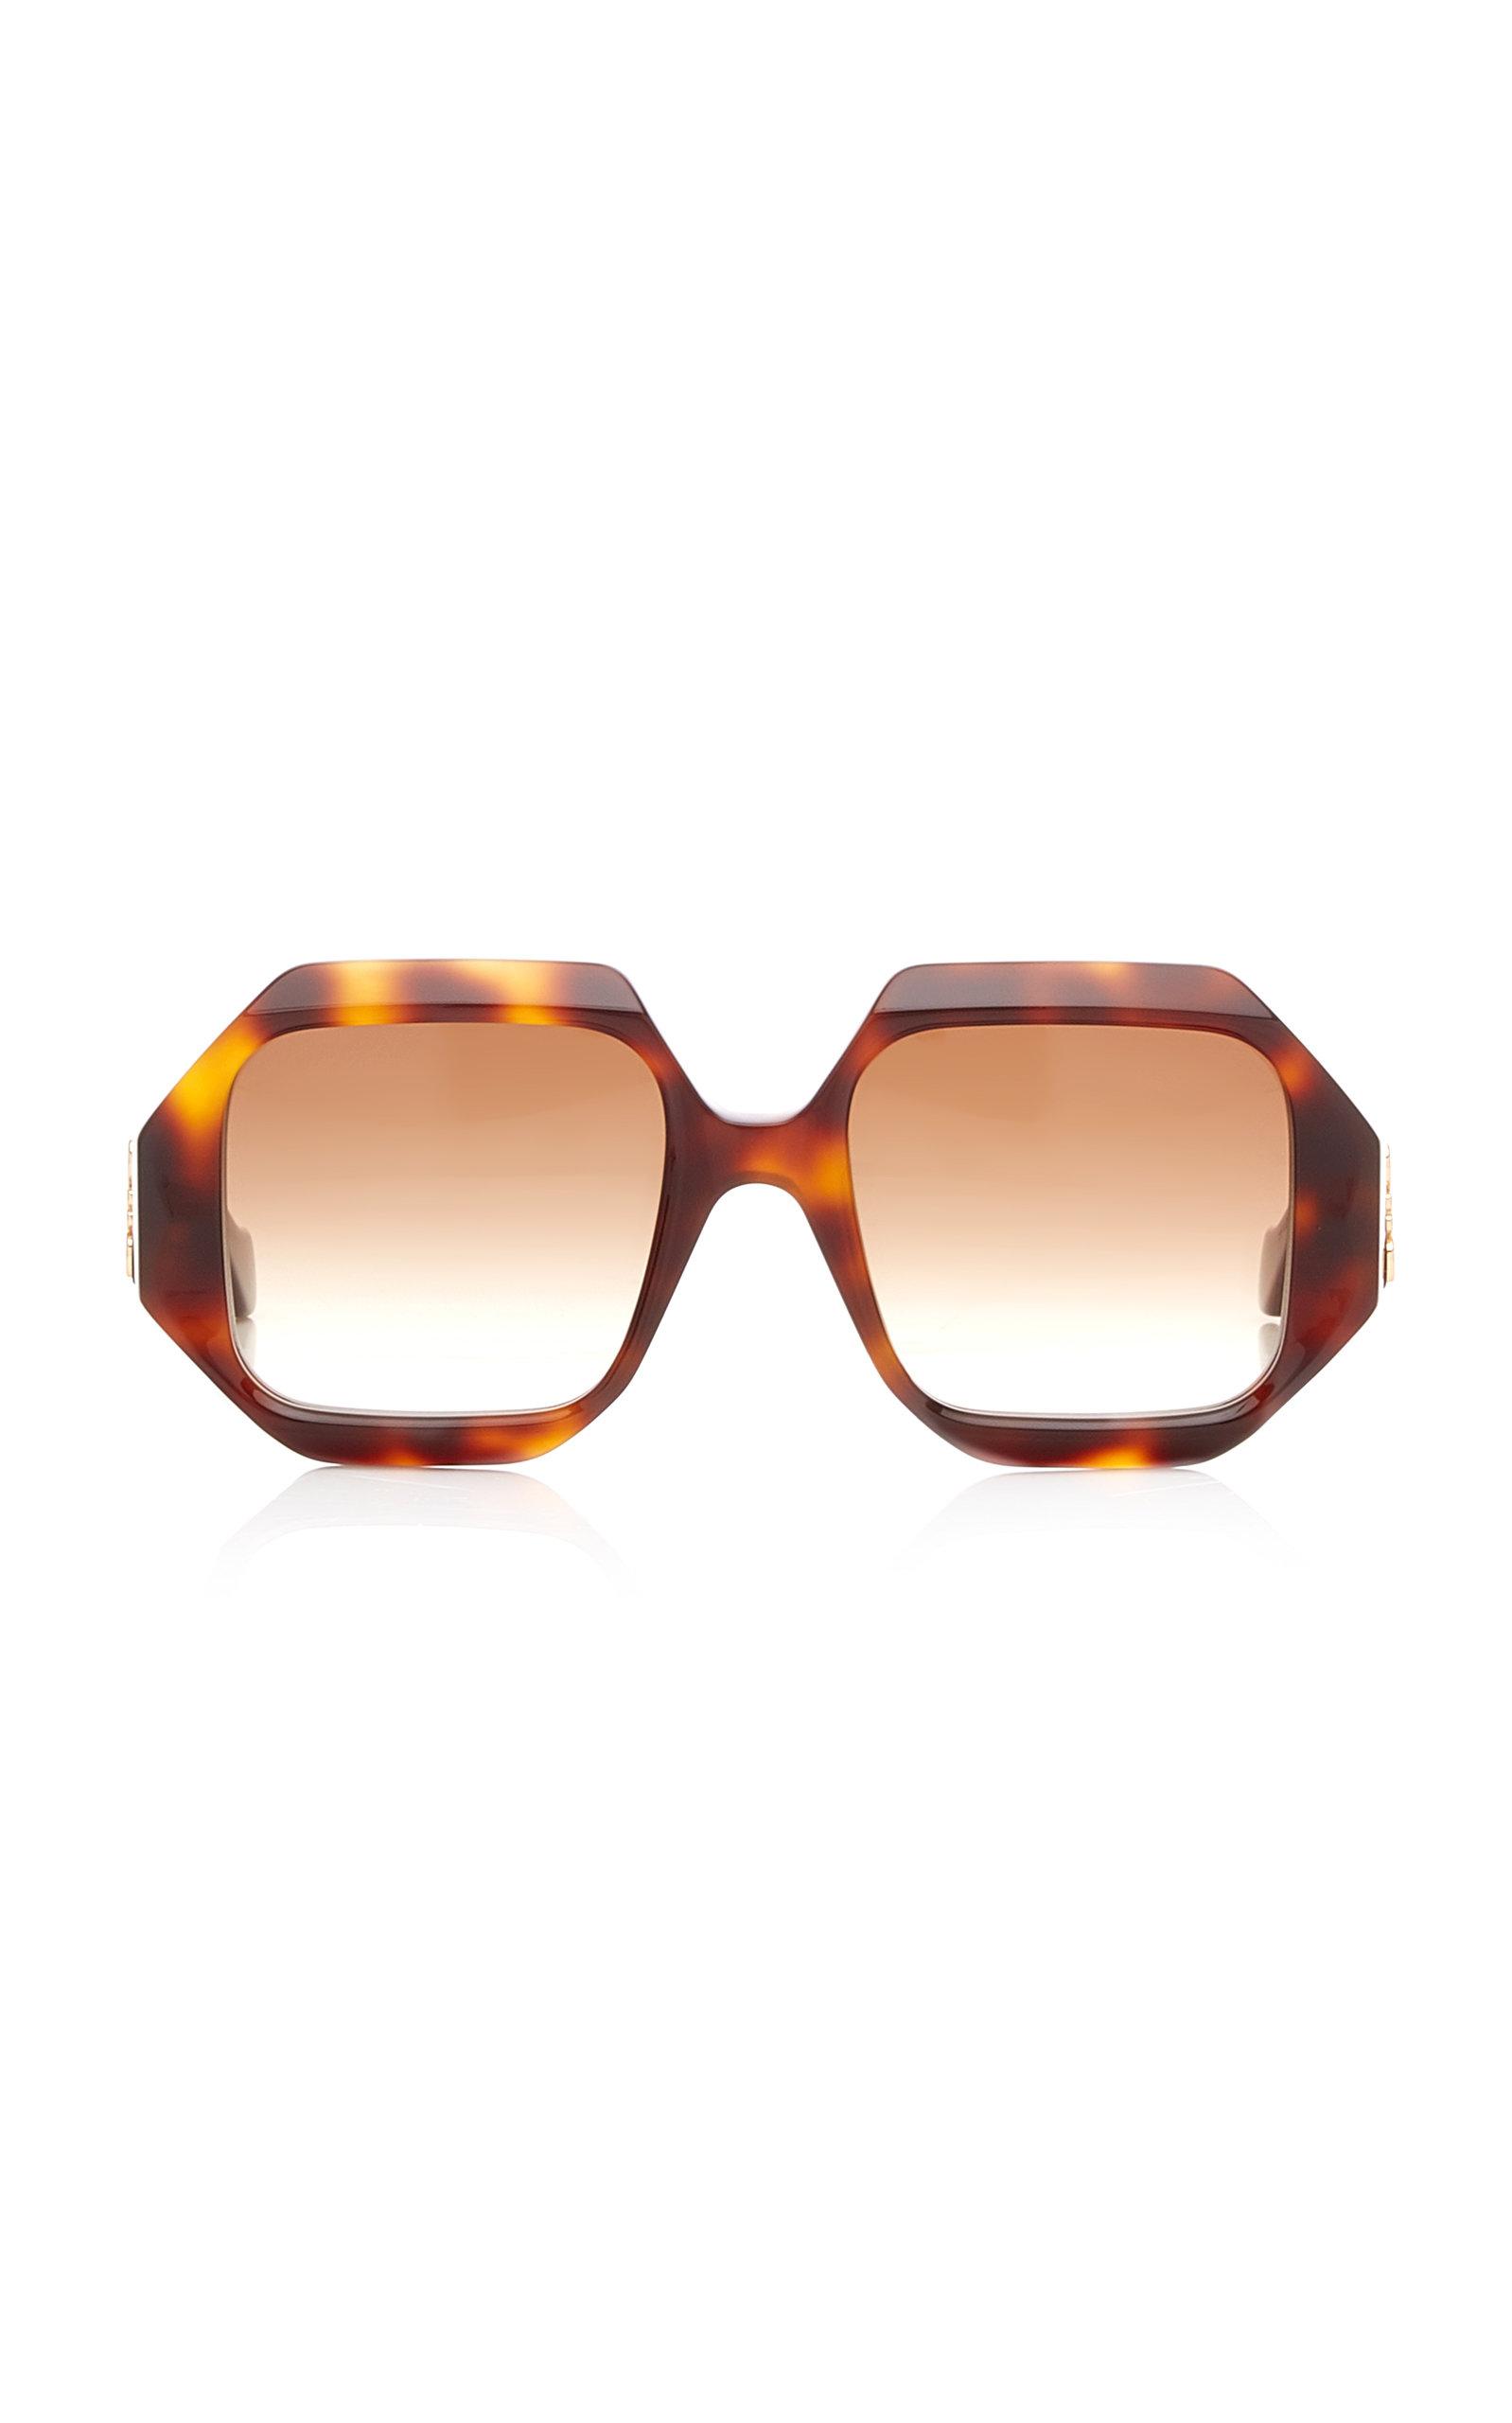 Loewe - Women's Oversized Square-Frame Acetate Sunglasses - Black/brown - Moda Operandi